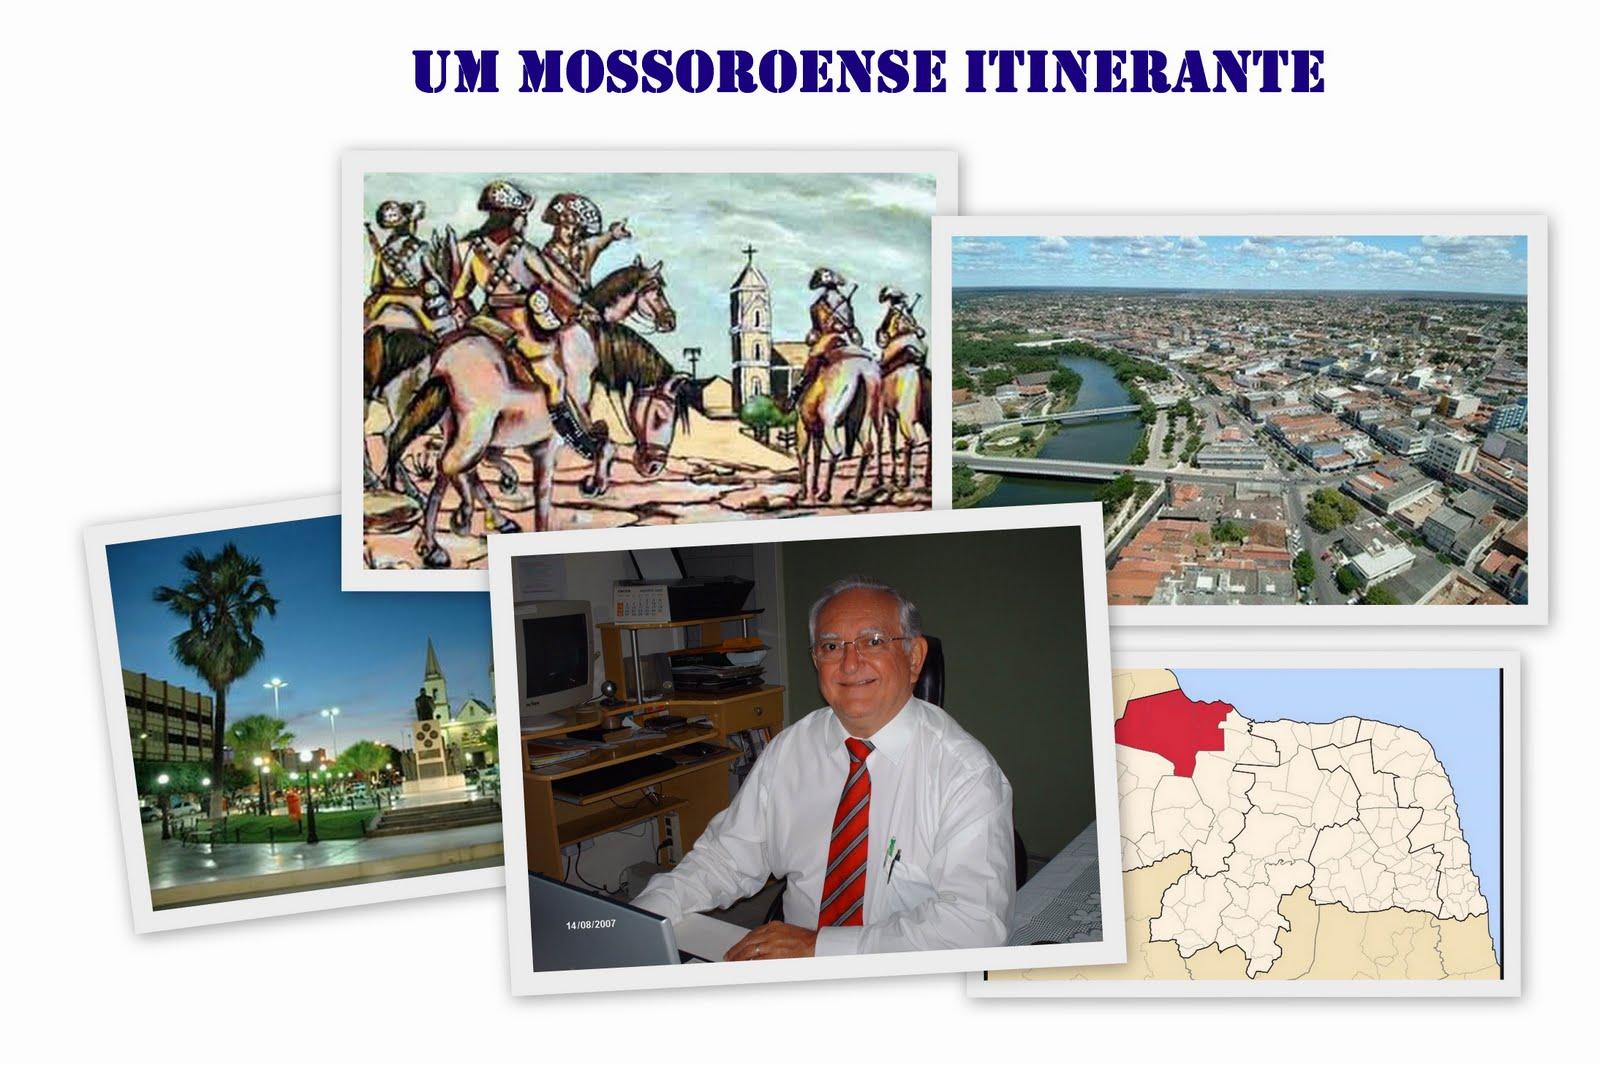 Um Mossoroense Itinerante